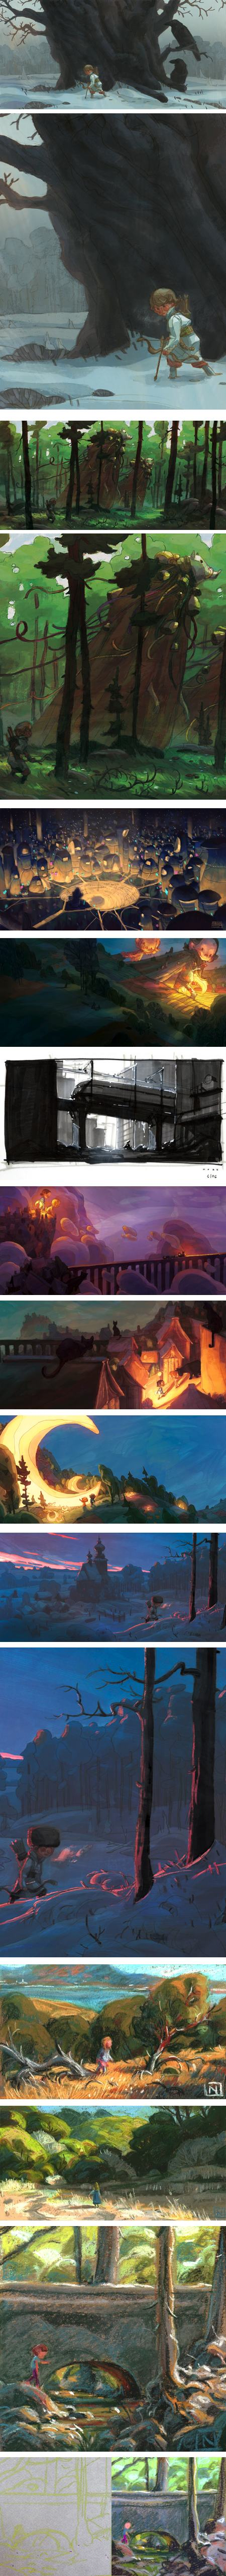 Noah Klocek, art director, production designer, concept artist, children's book illustrator, digital and pastel